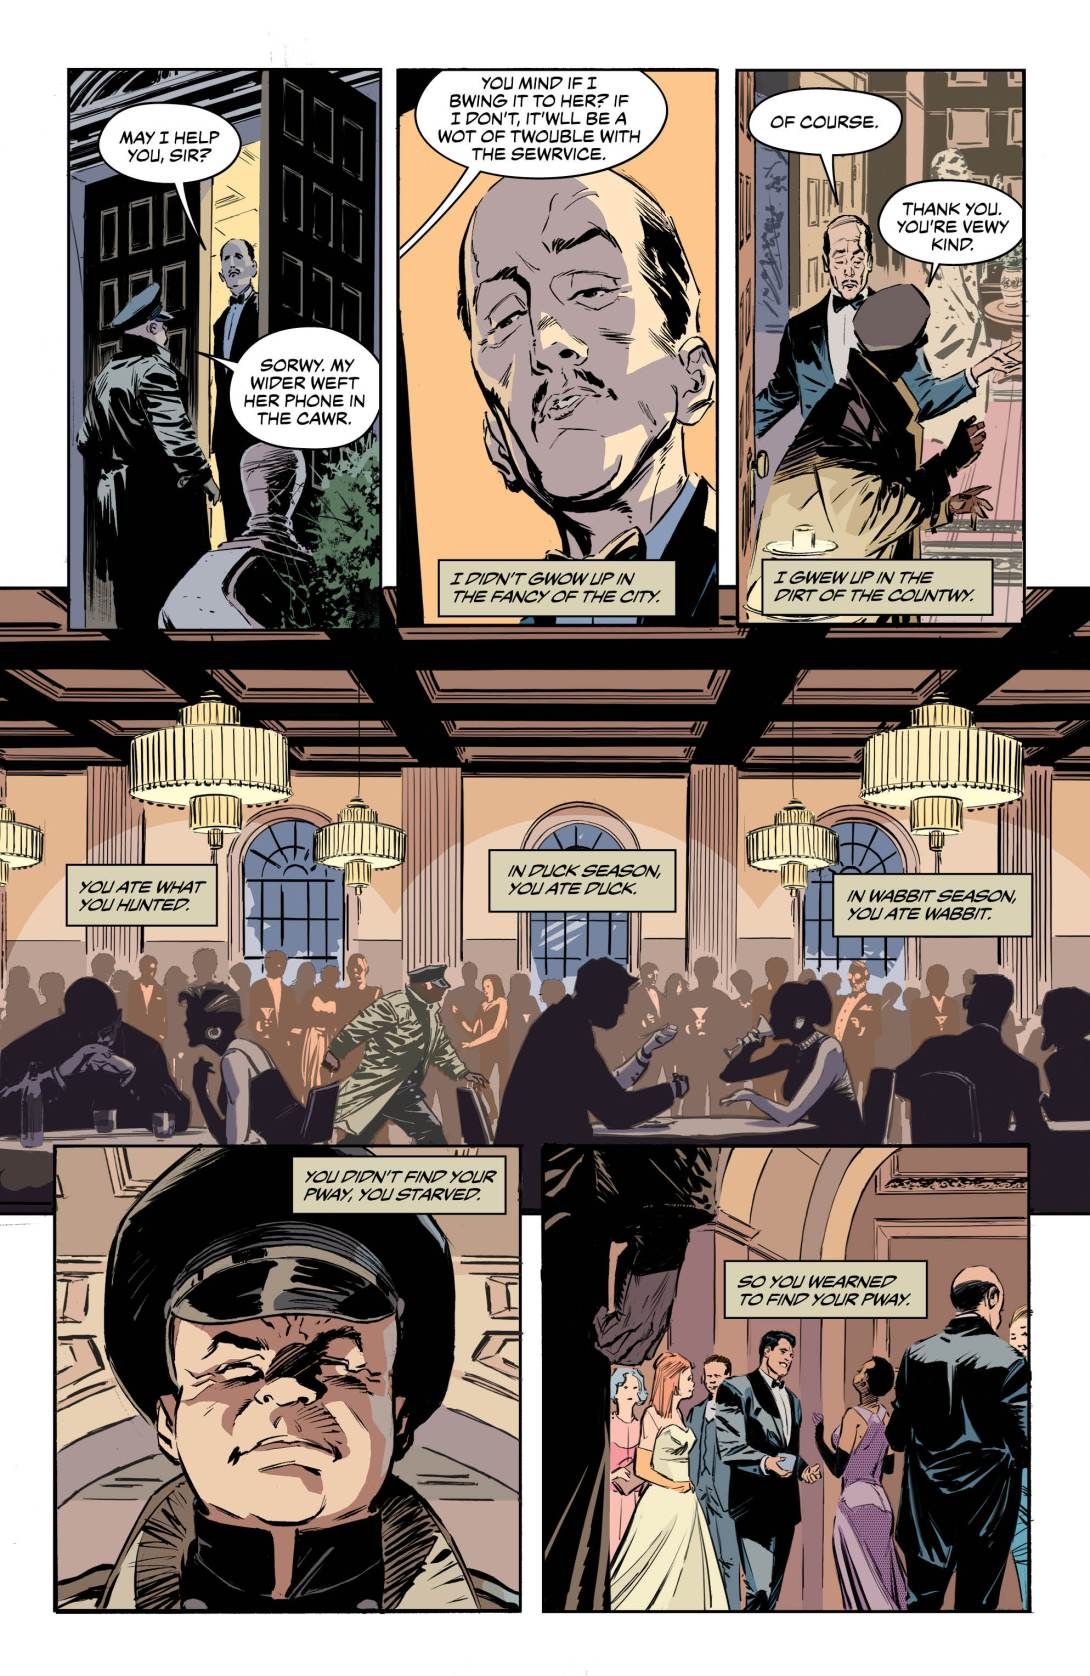 Batman Emer Fudd 1 - DC Comics News